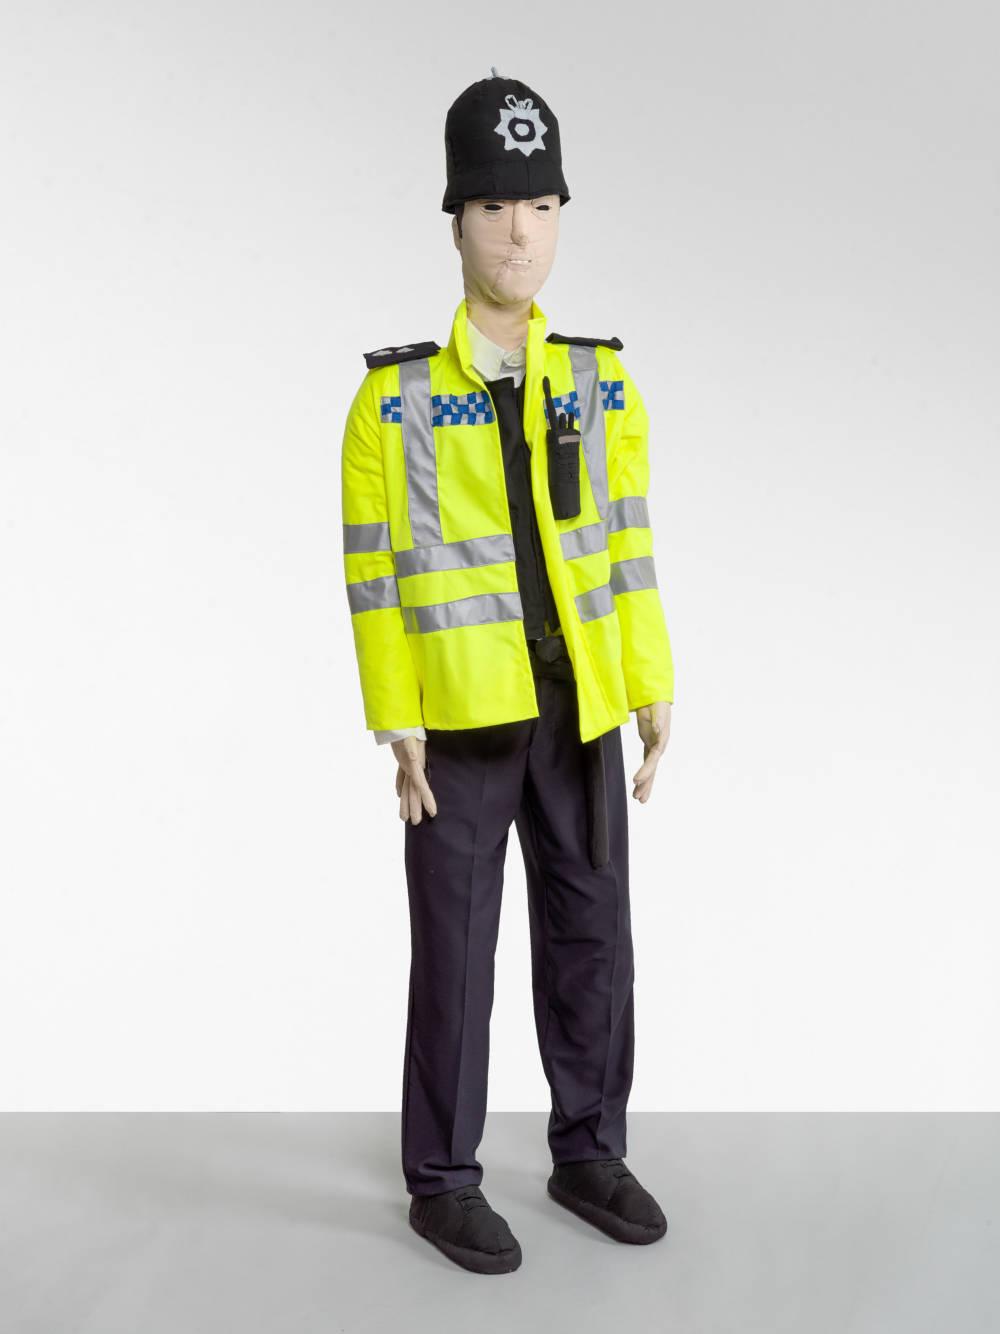 Polizist (Policeman)